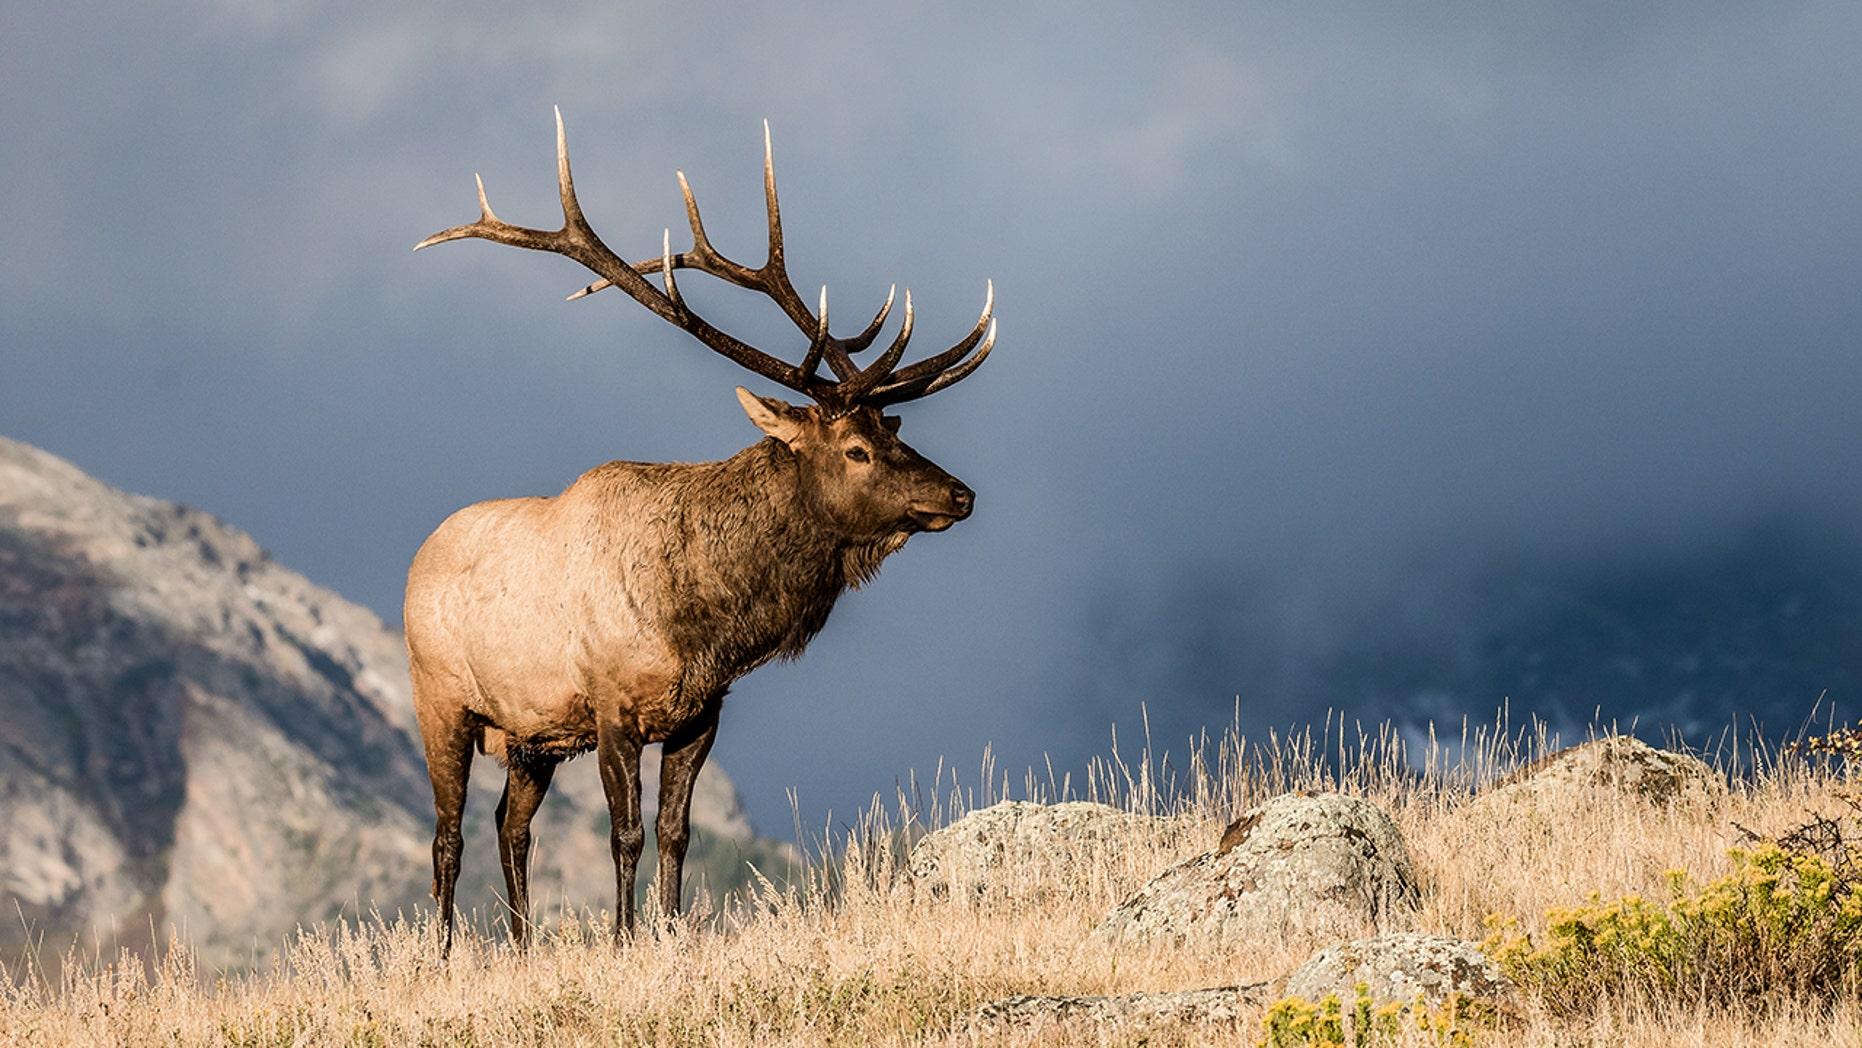 Wisconsin hunter cited for illegally shooting elk across the street fox news - Elk hunting wallpaper ...